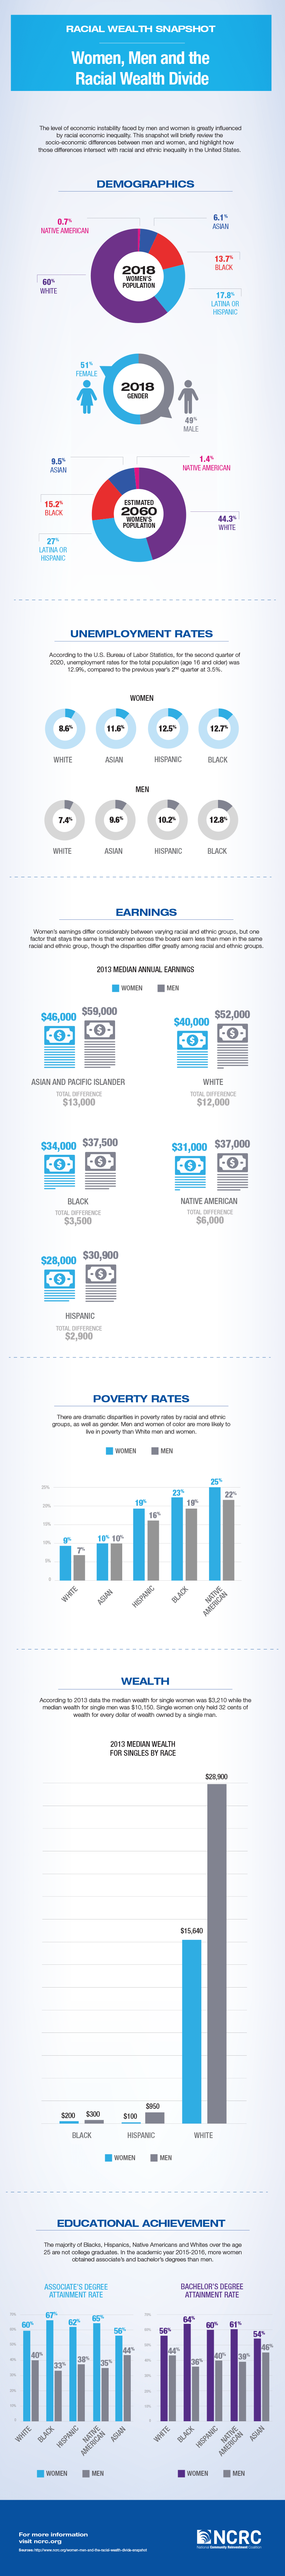 Racial Wealth Divide _Gender